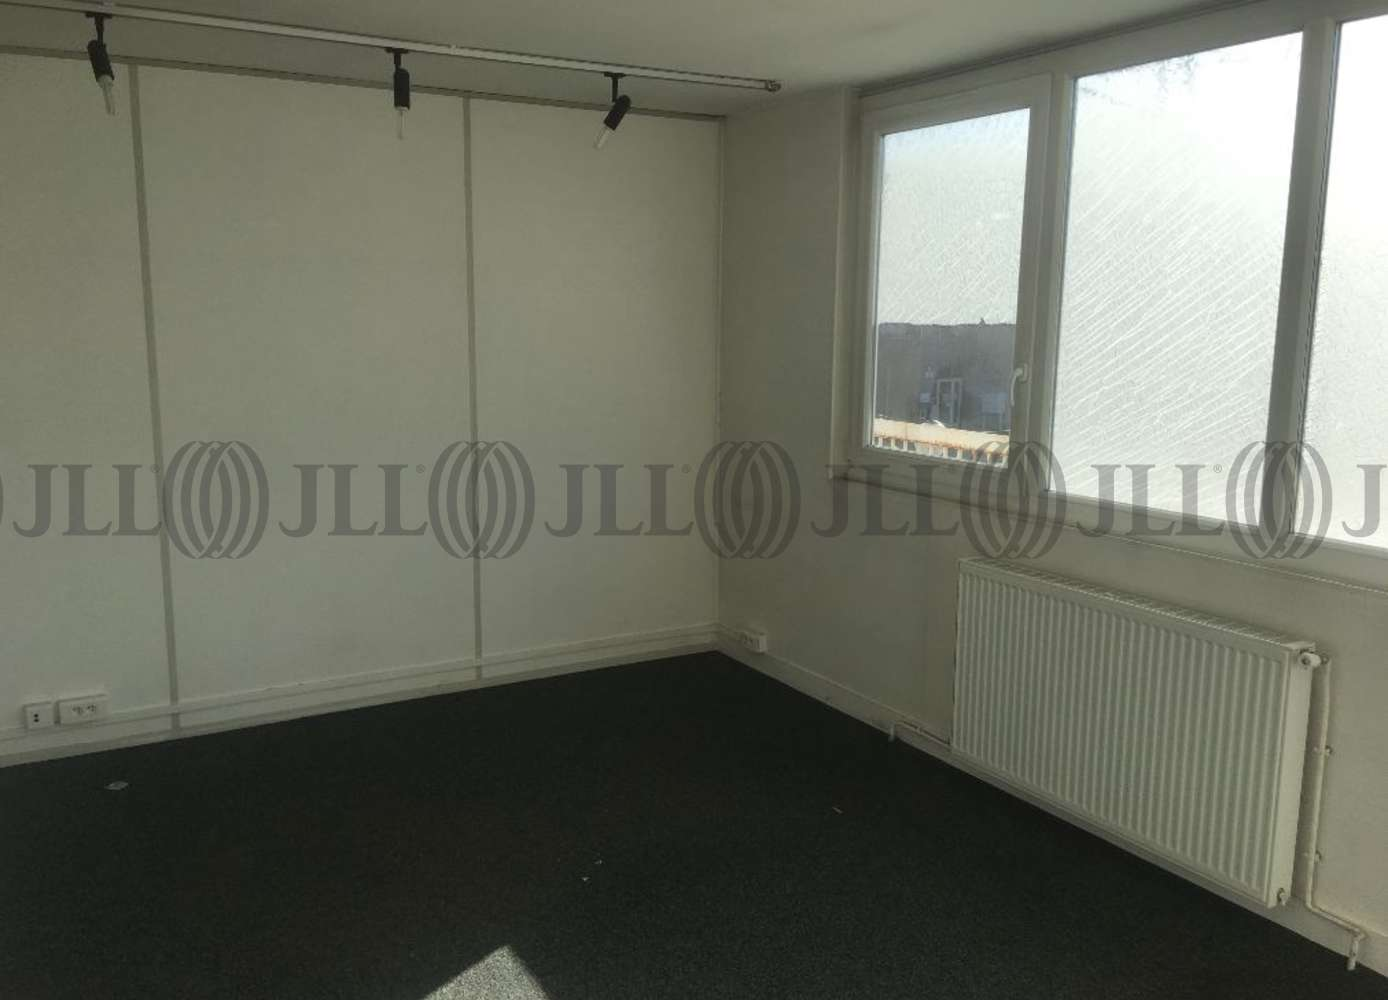 Activités/entrepôt Cergy, 95000 - 43 RUE FRANCIS COMBES - 10736071